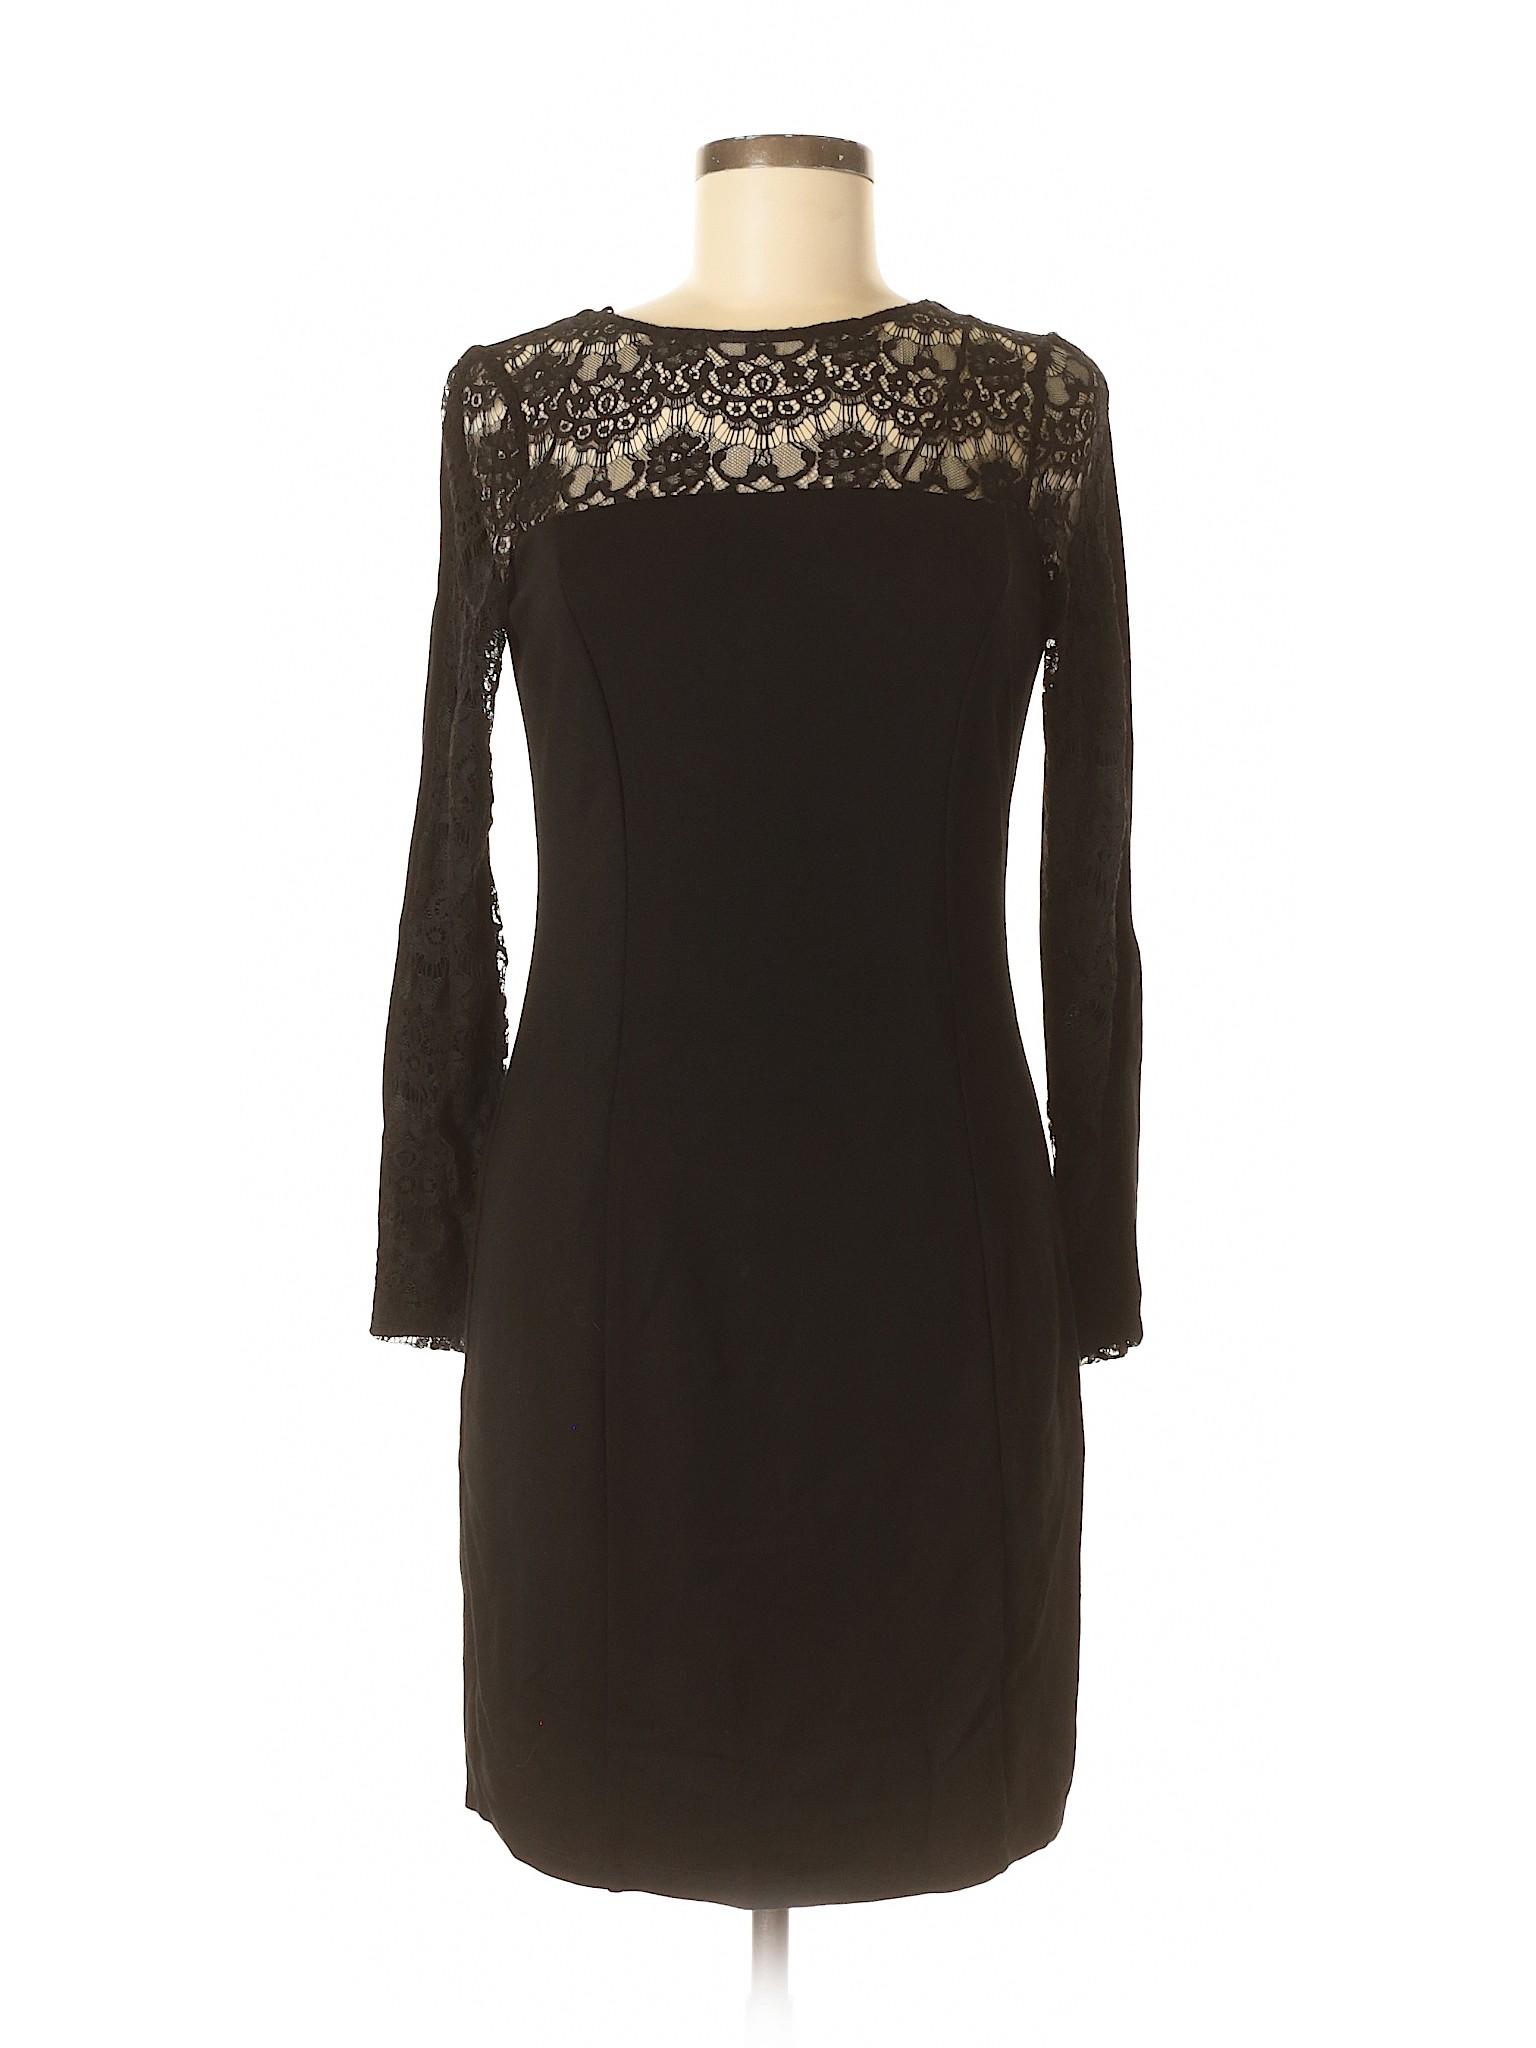 Casual winter Simpson Dress Jessica Boutique pqgw4zBBP